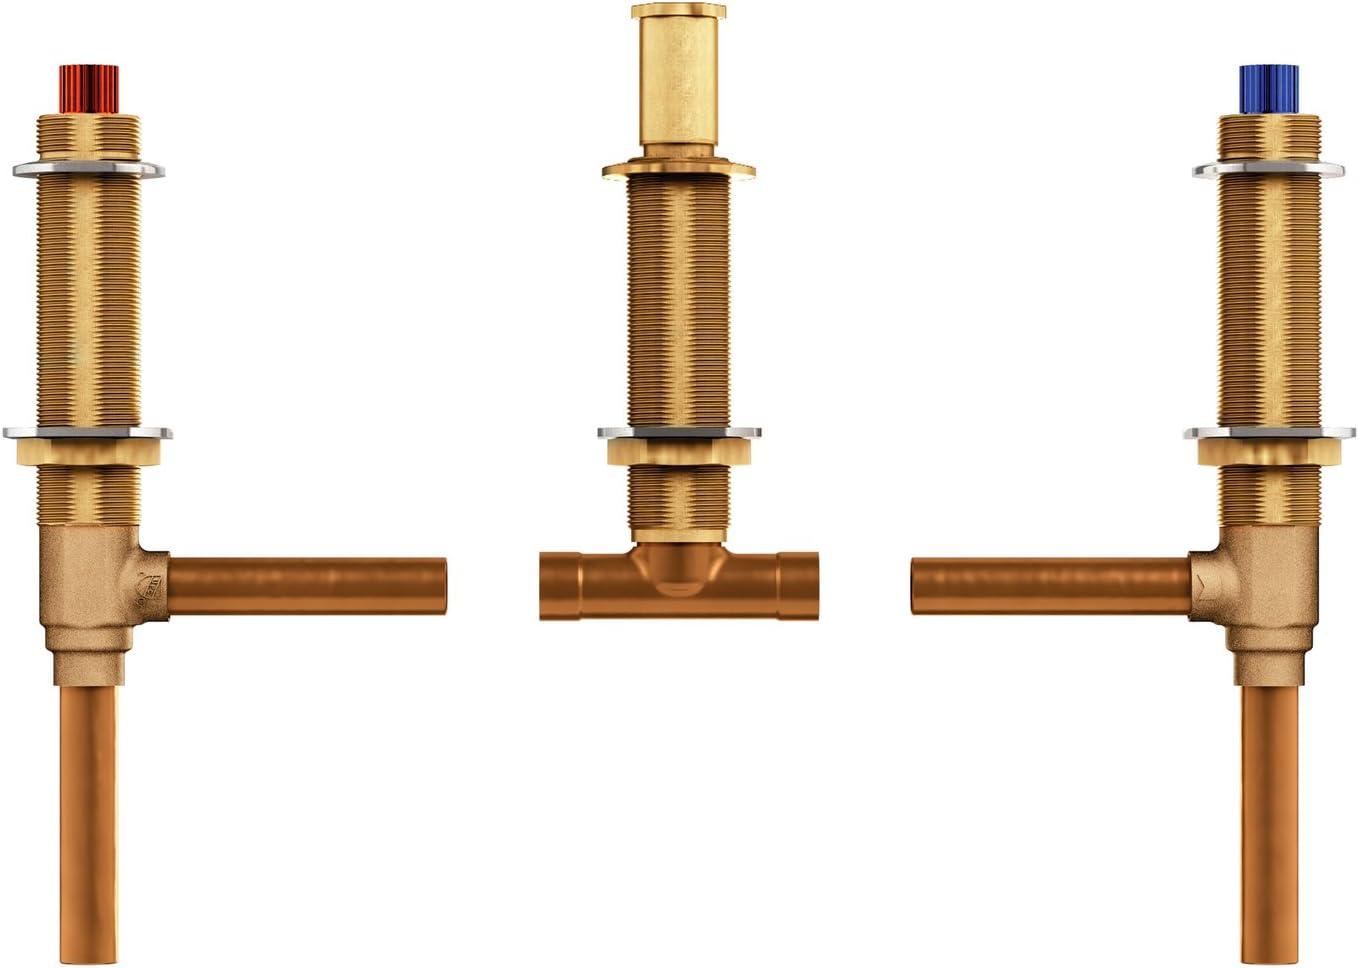 Moen 4792 Two Handle 3-Hole Roman Tub Valve Adjustable 1/2-Inch CC Connection, Brass